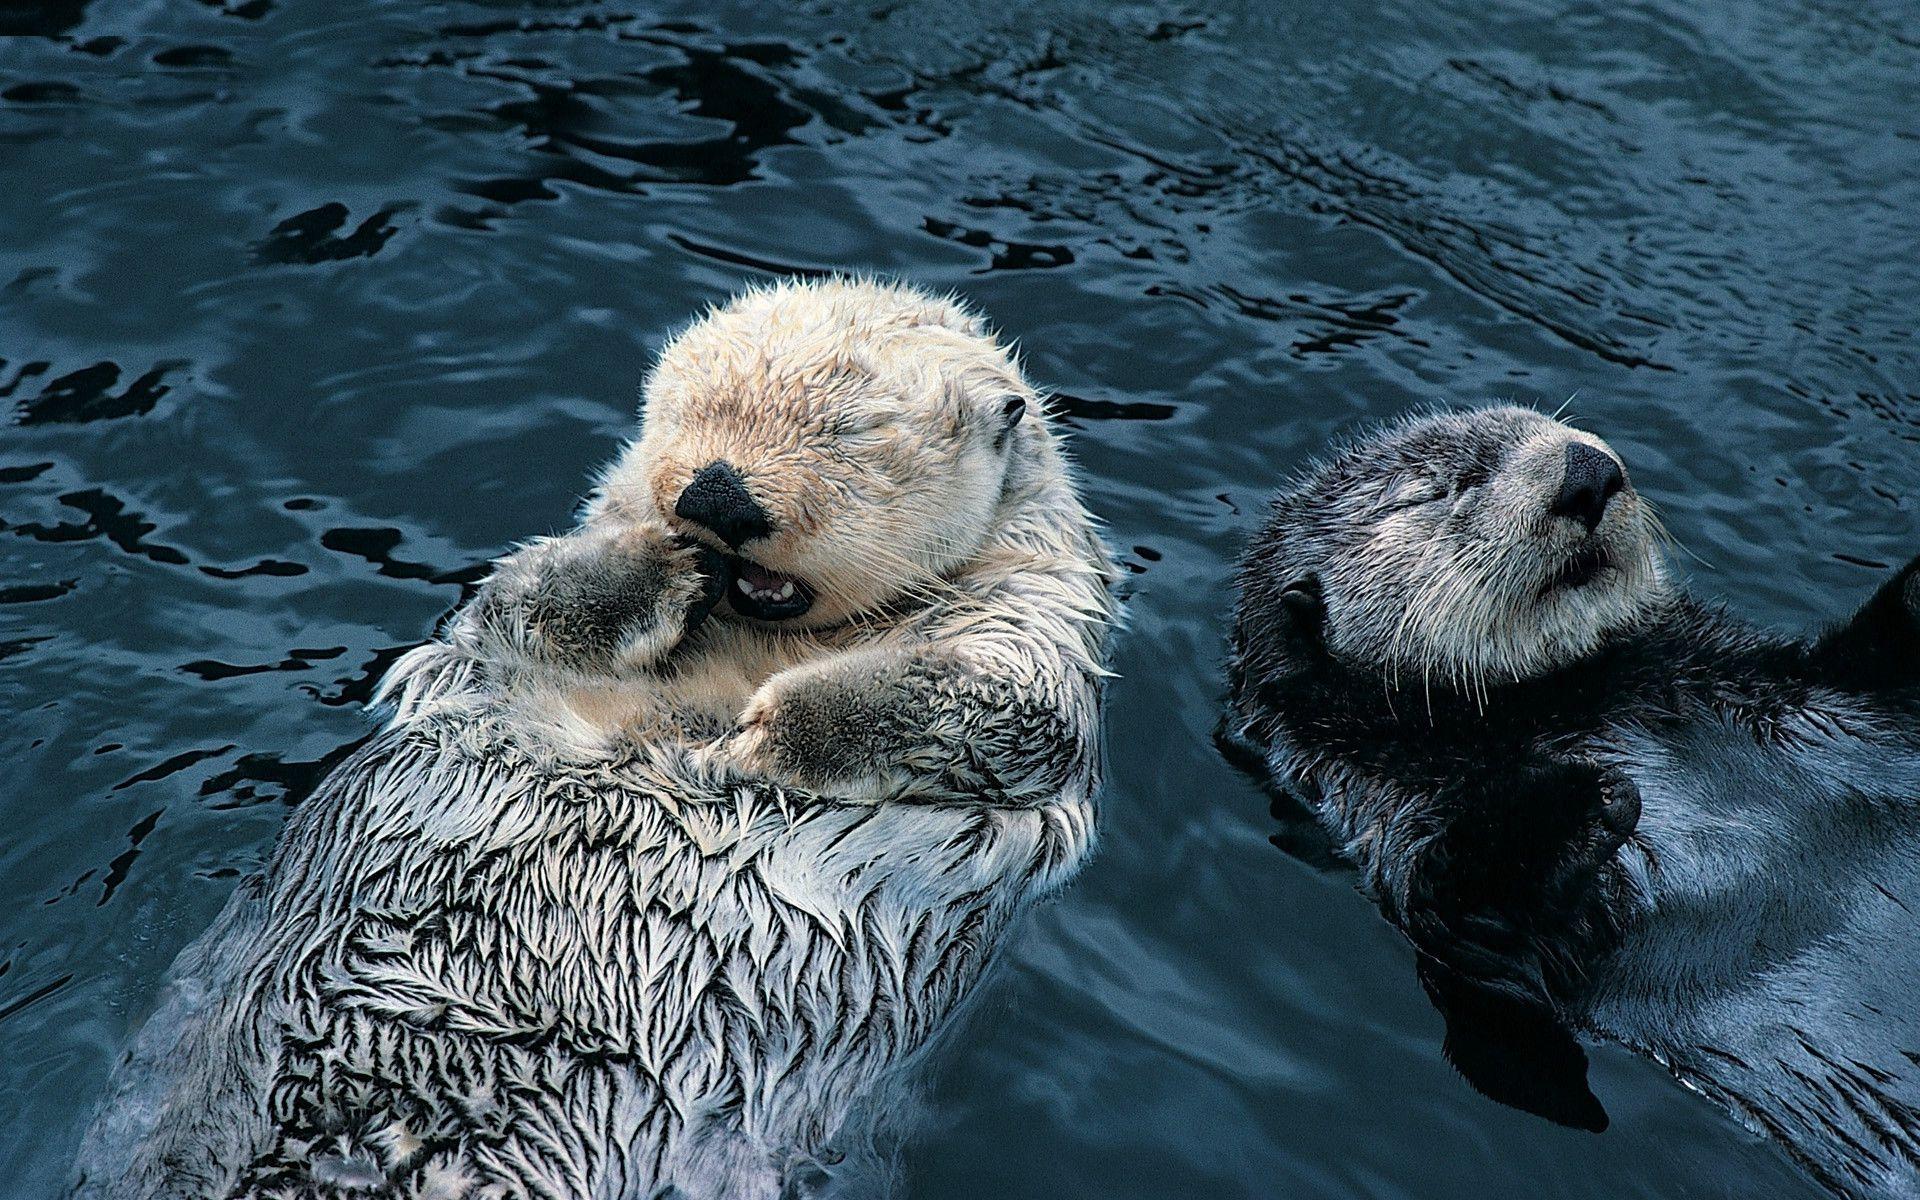 Sea Otter Wallpaper 1920x1200